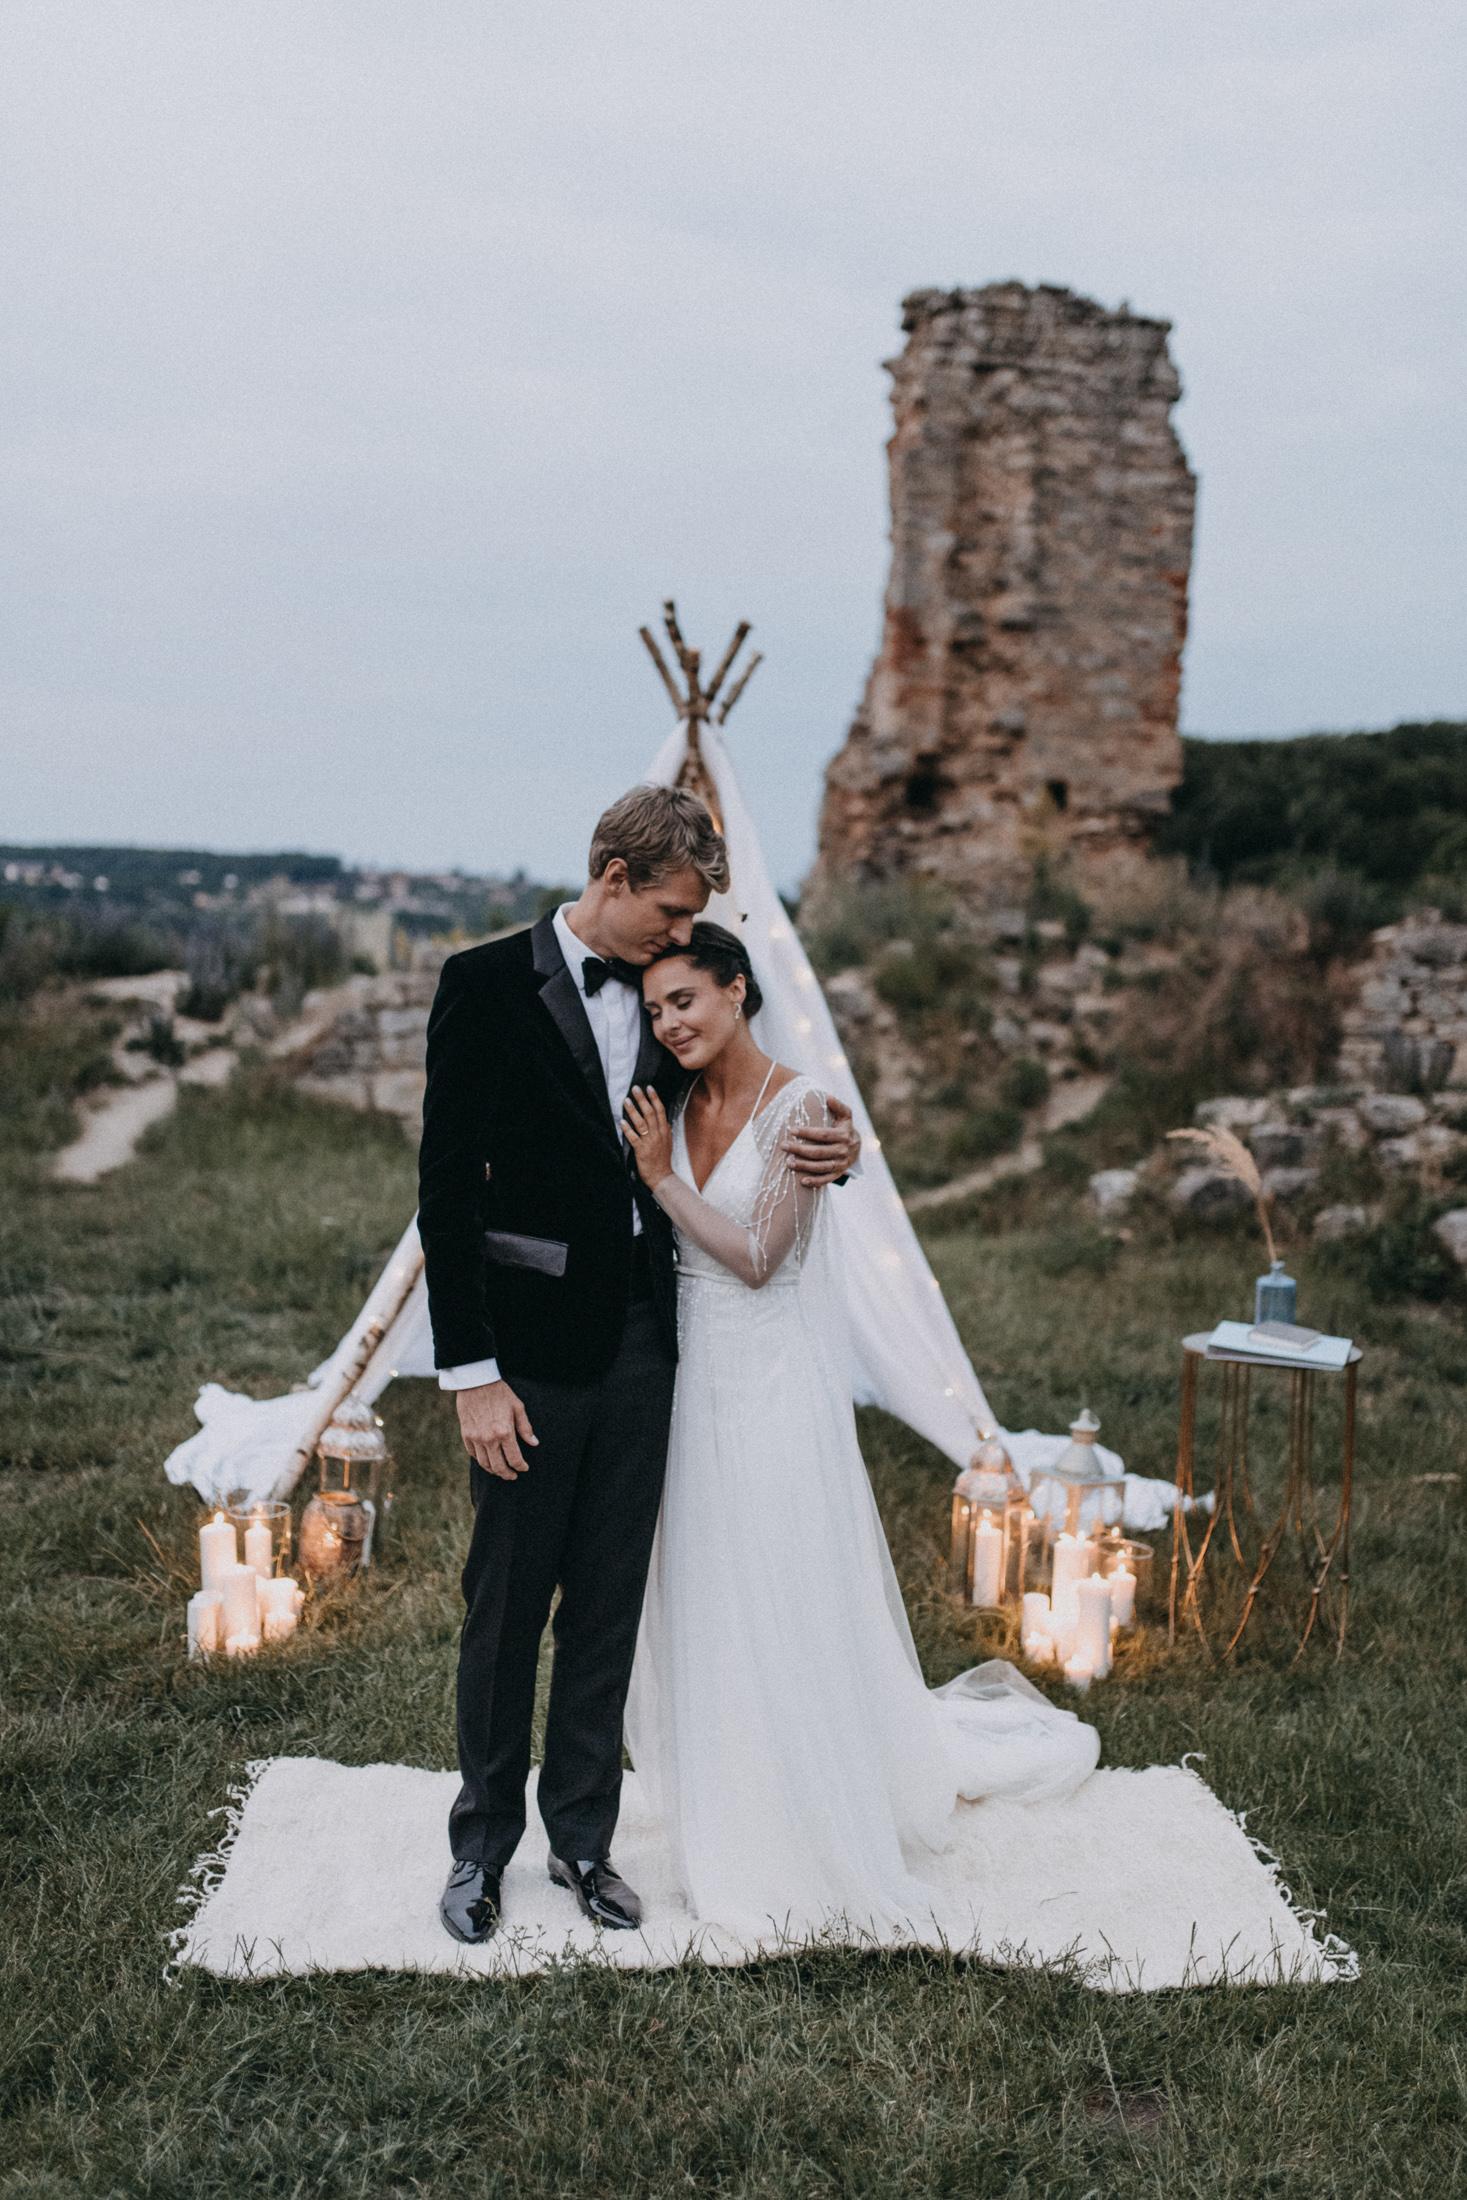 evening castle ruins wedding ceremony